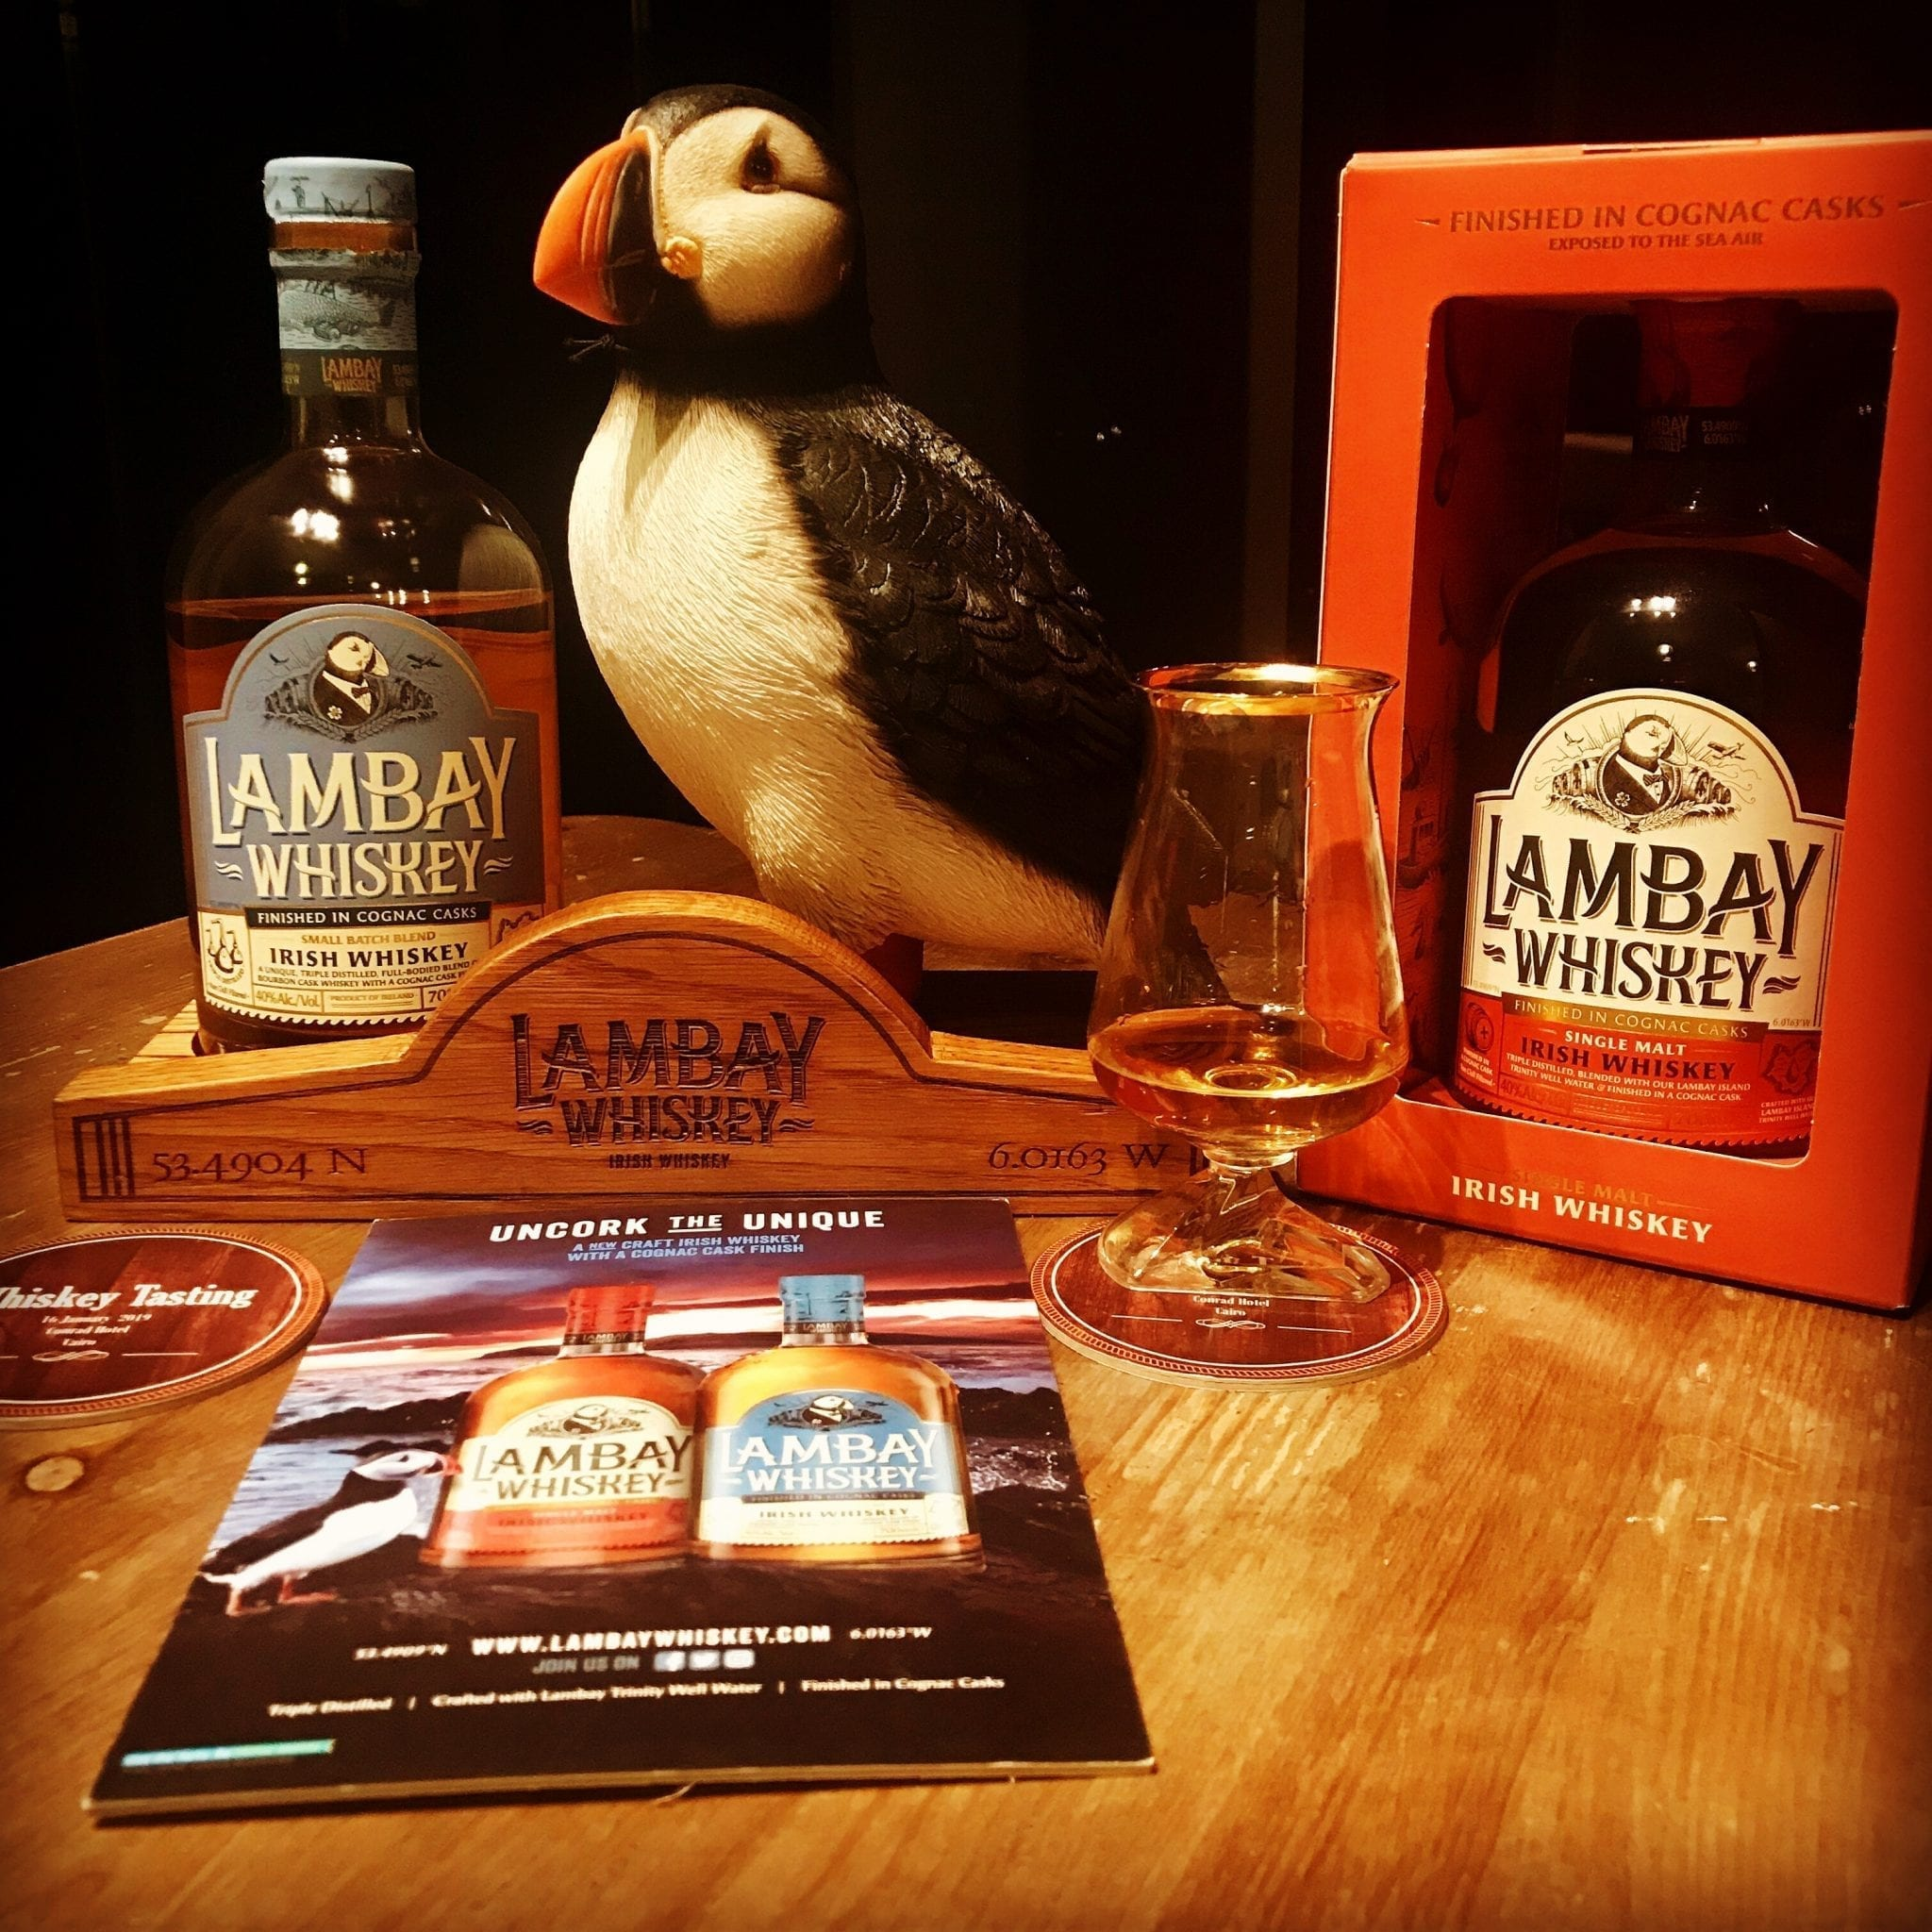 Lambay Whiskey Tours and Lambay Whiskey Puffin Irish Whiskey Trail